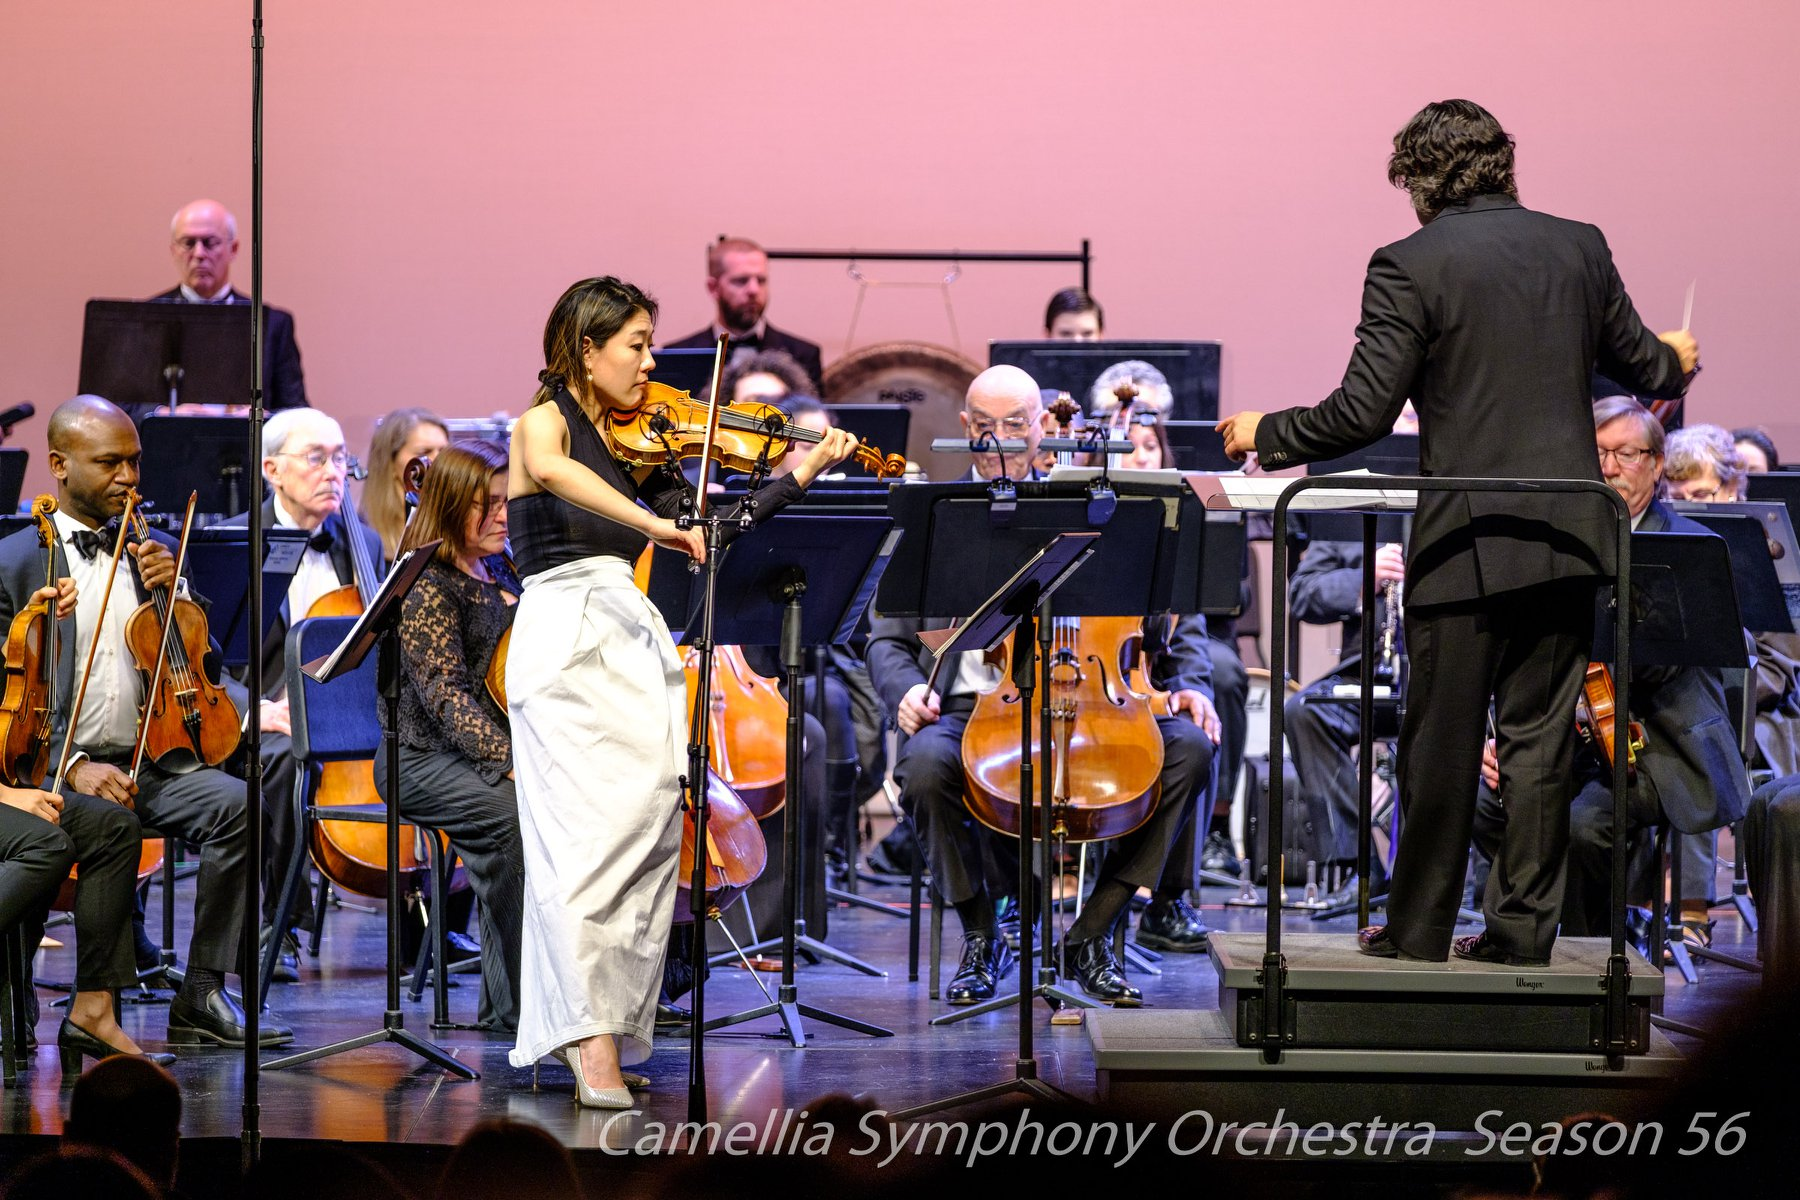 Camellia Symphony Orchestra // Feb 16, 2019..